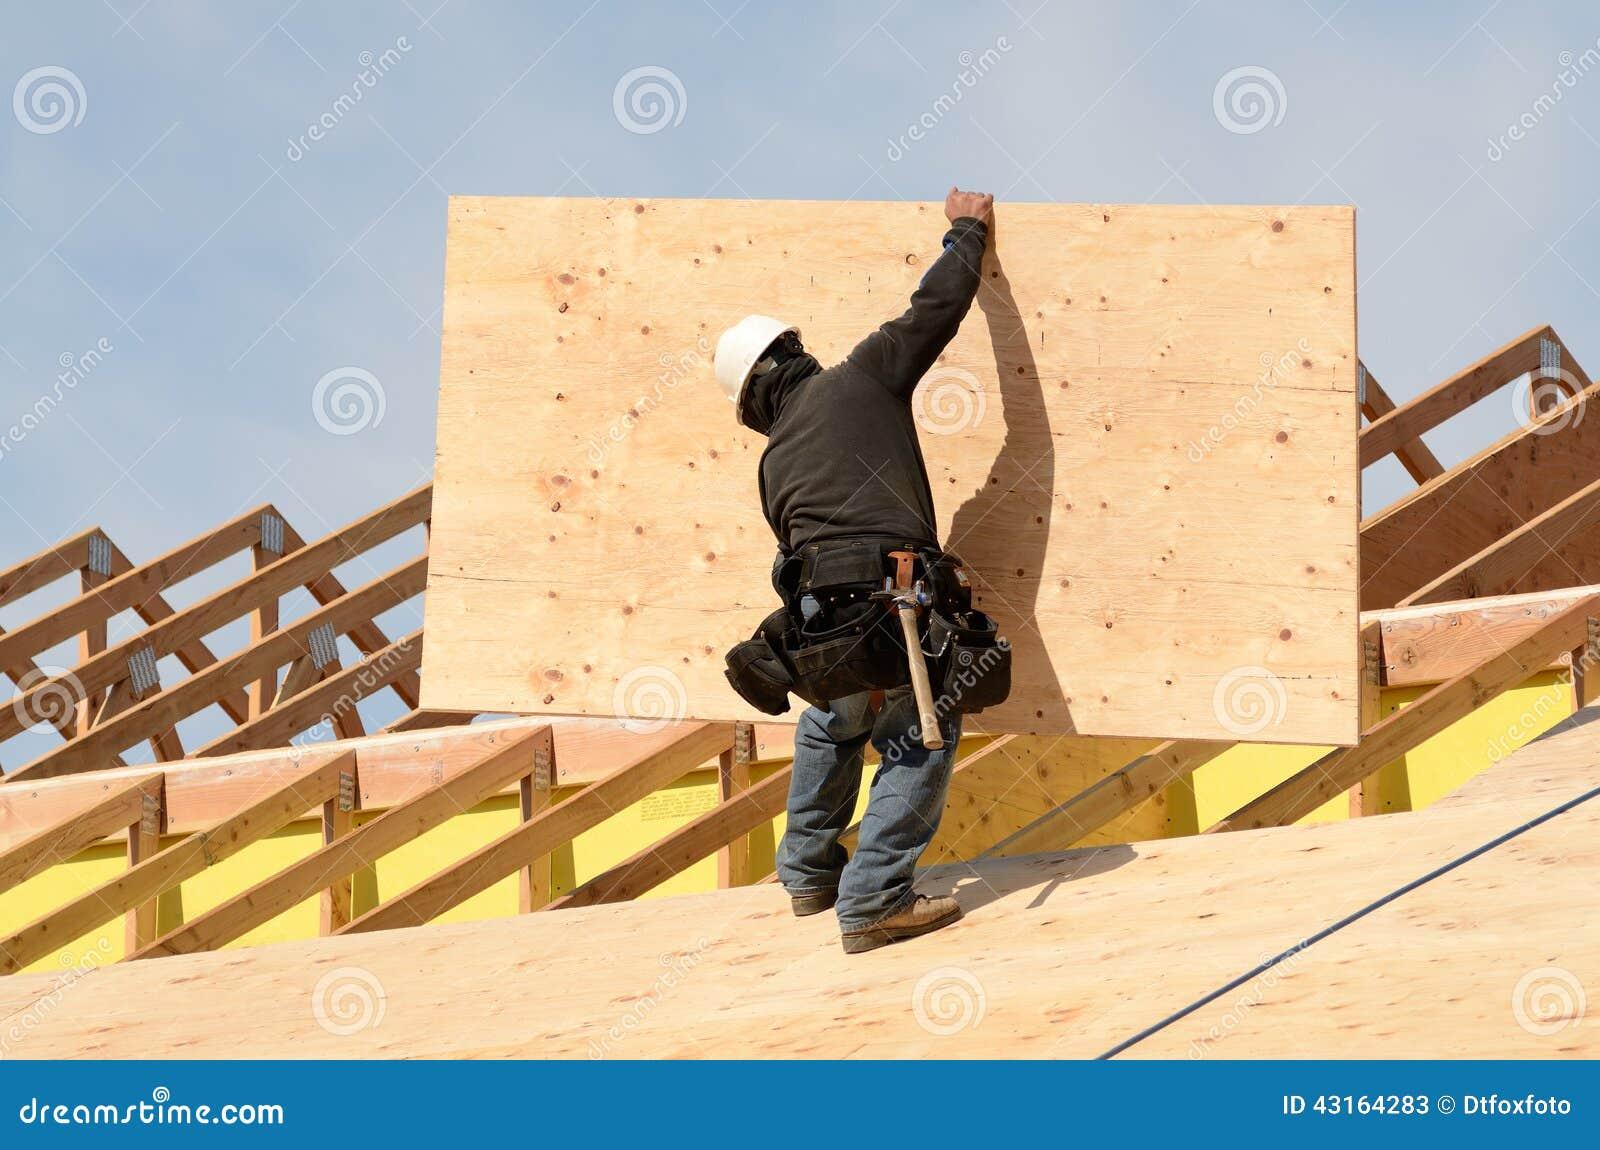 Roof Sheet Stock Photo Image 43164283